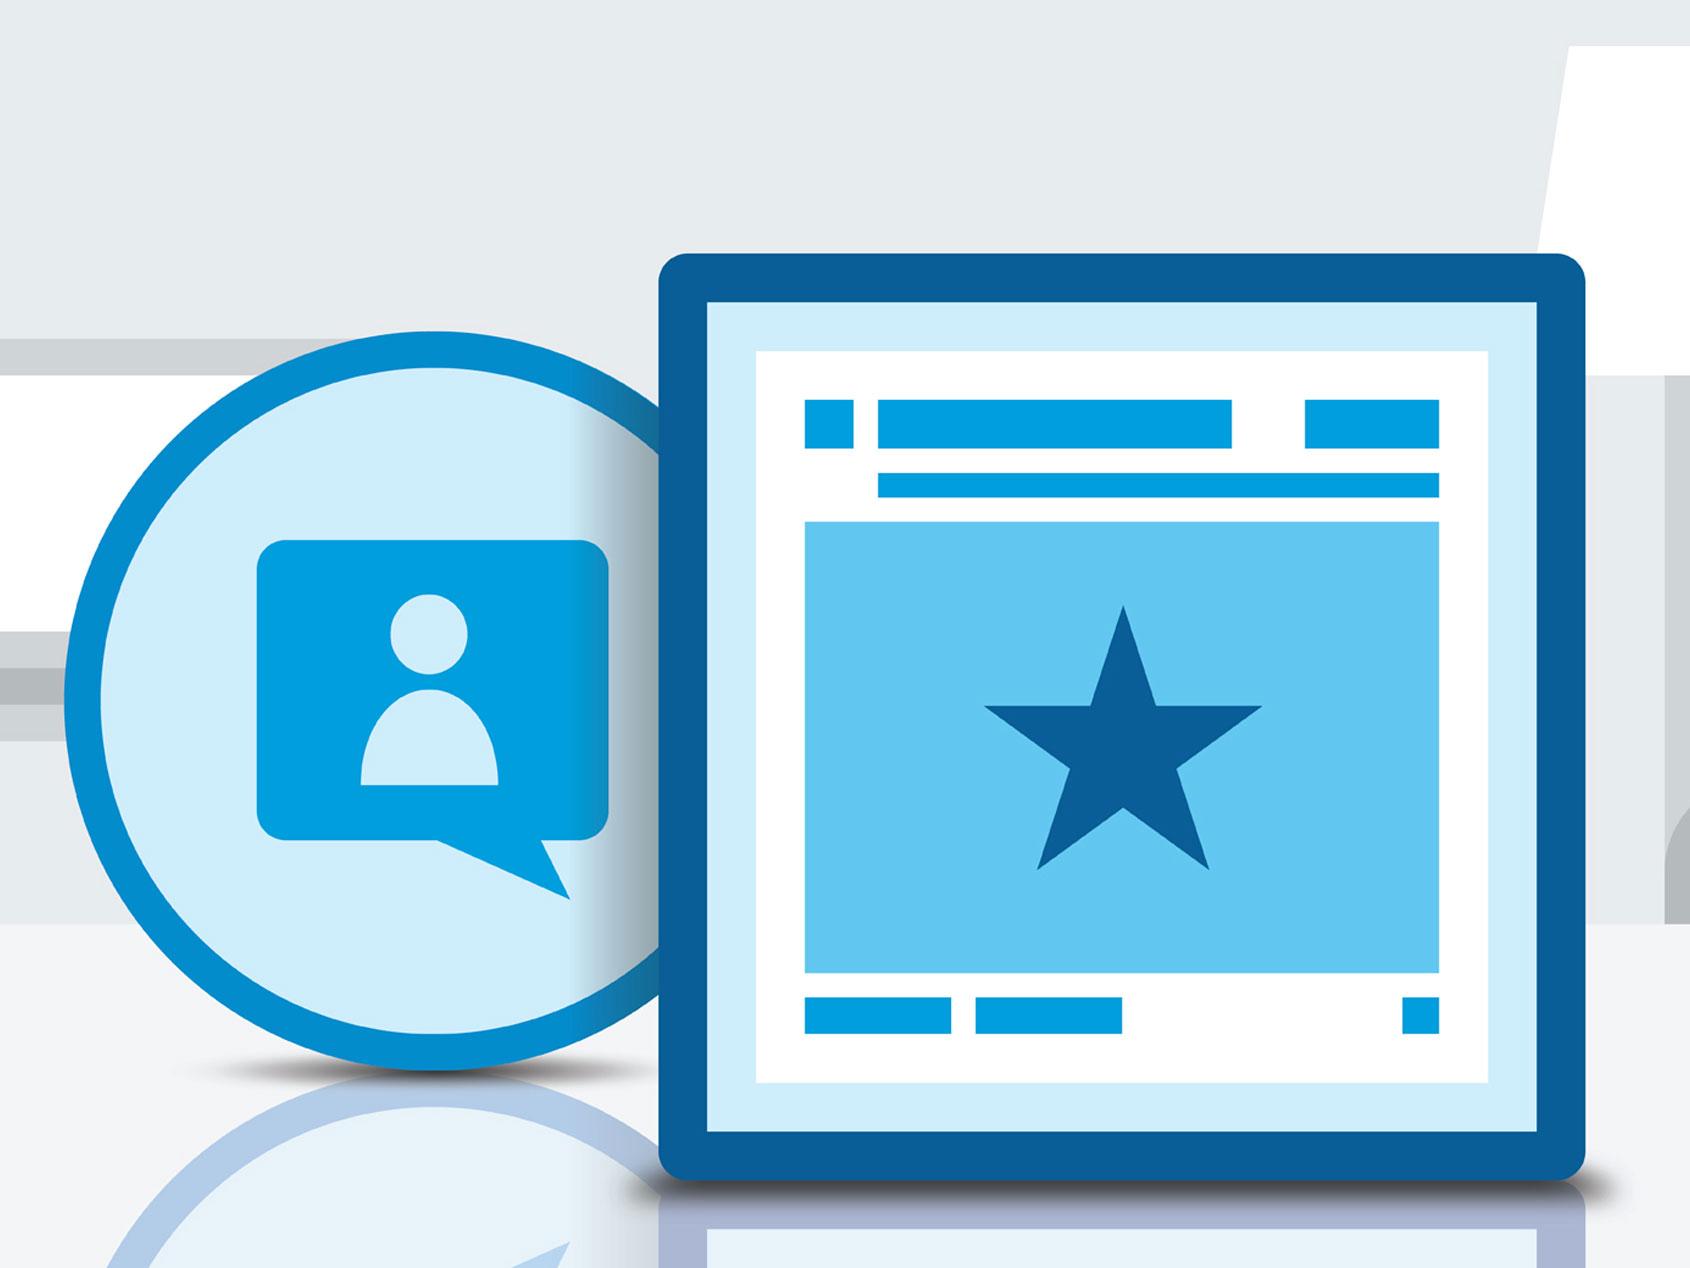 Come targetizzare le campagne su Facebook con Google Display